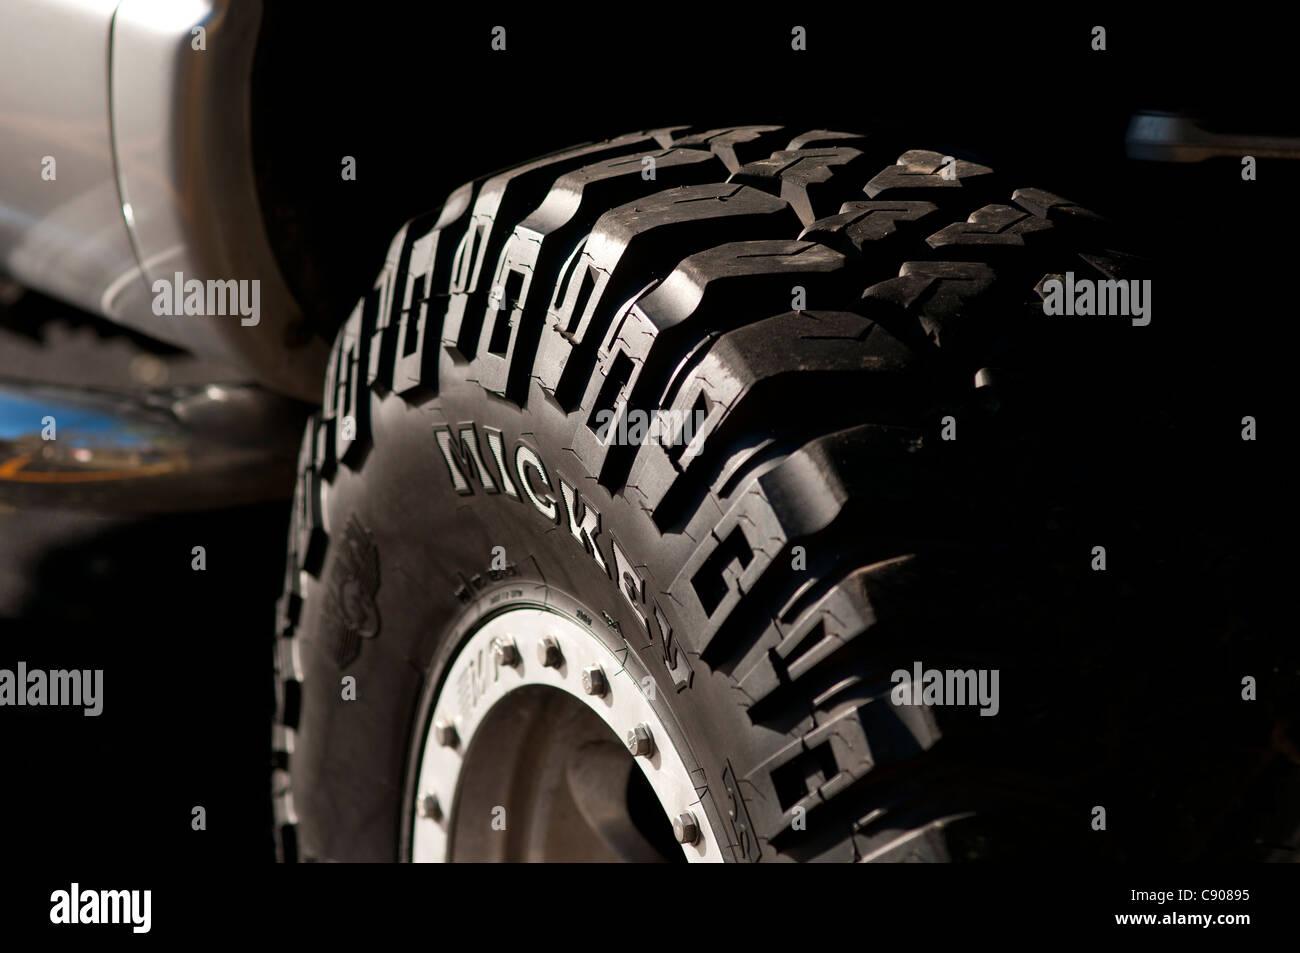 Tire tread. - Stock Image